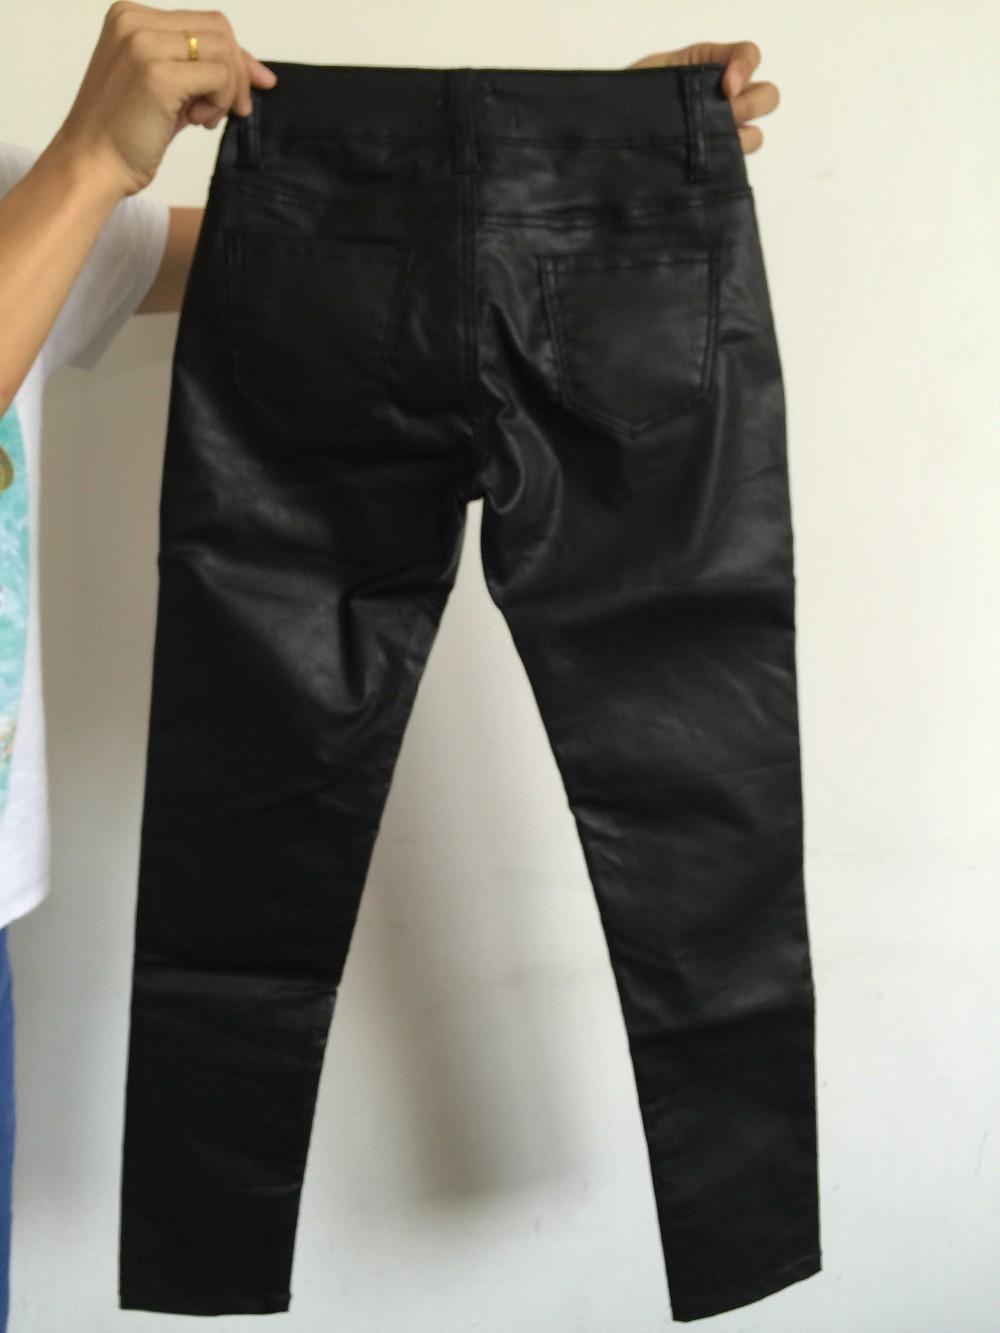 729a6d62c0 Botón de moda skinny cintura alta pantalones lápiz mujeres ...